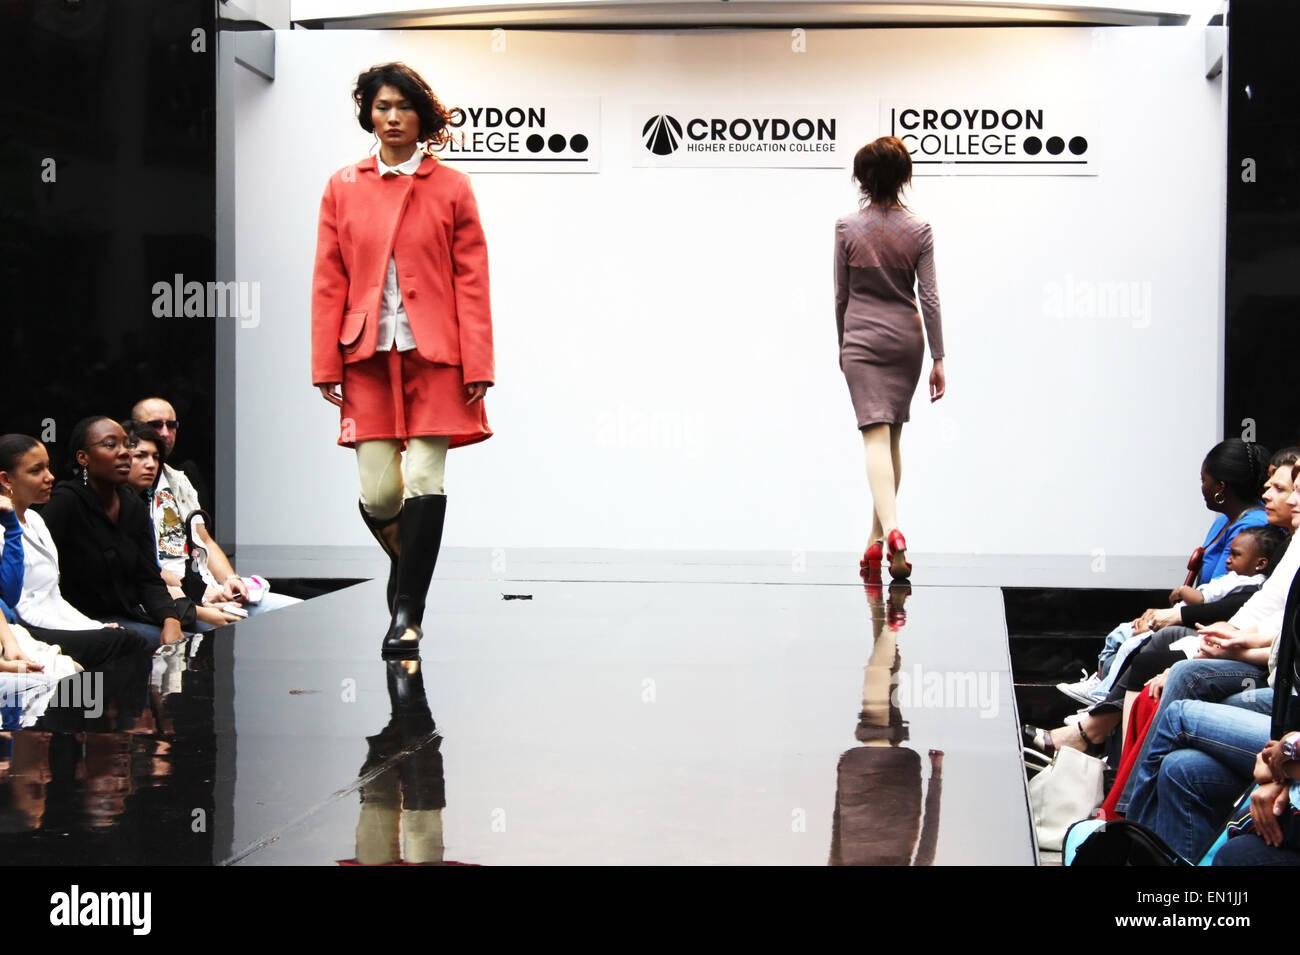 CROYDON, LONDON - JUNE 18 : Models in Fashion Festival on June 18, 2008 in Whitgift Shopping Centre, Croydon, England Stock Photo